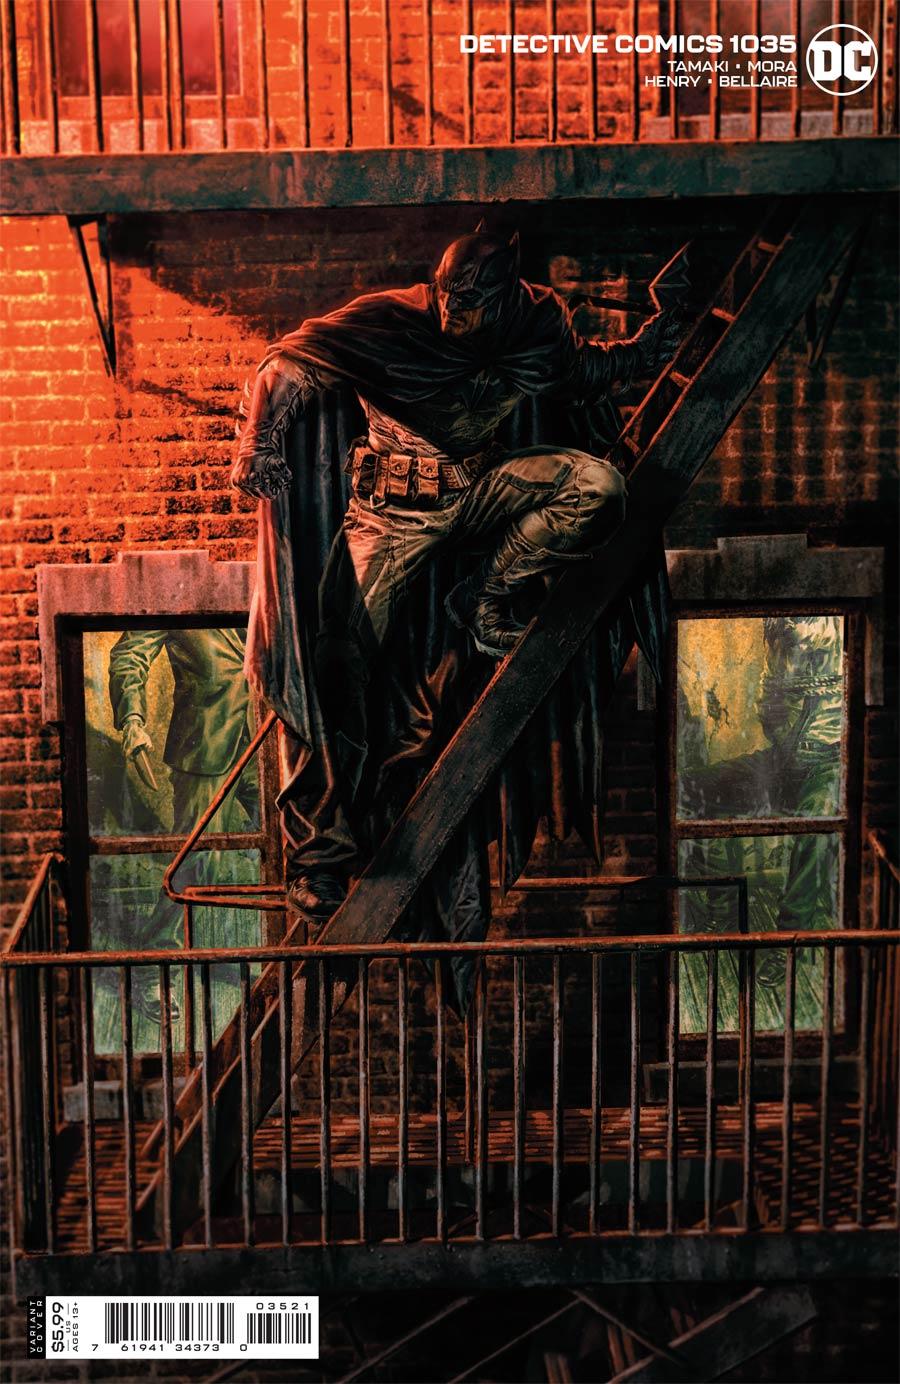 Detective Comics Vol 2 #1035 Cover B Variant Lee Bermejo Card Stock Cover